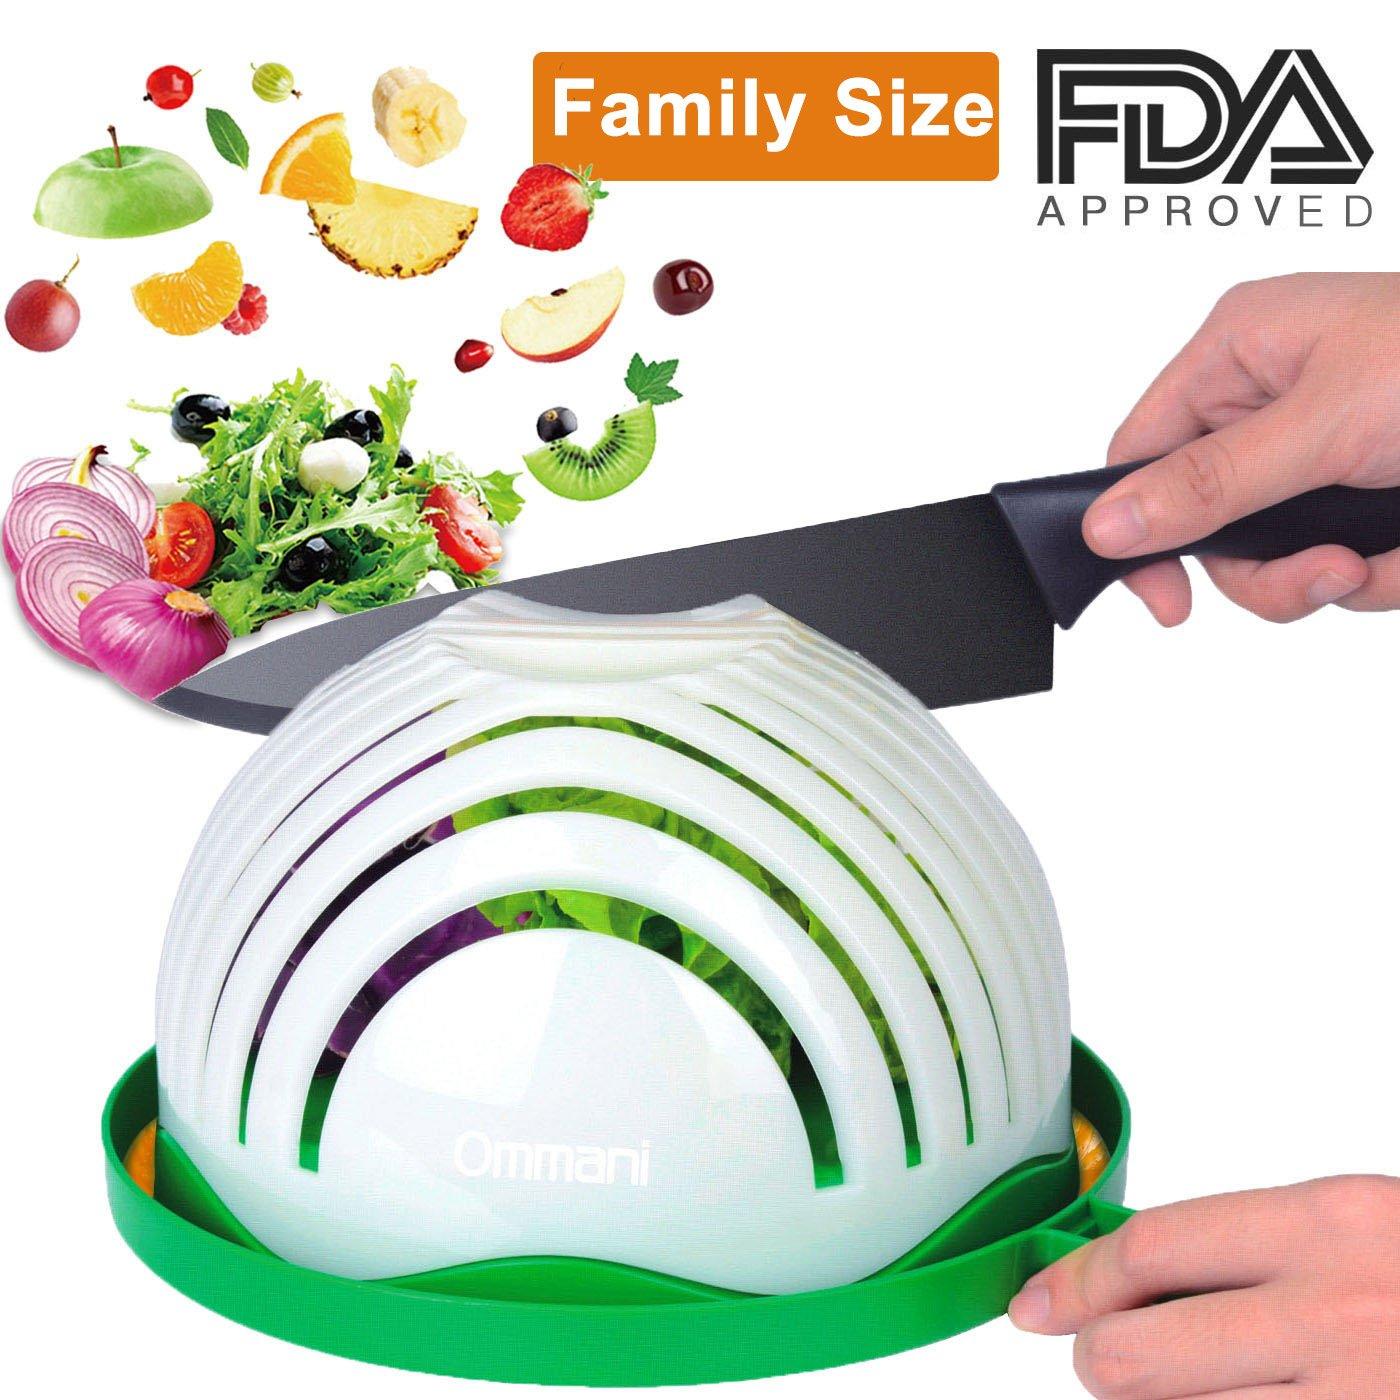 Amazon.com: Ommani Salad Cutter Bowl, 60 Second Salad Maker Family ...